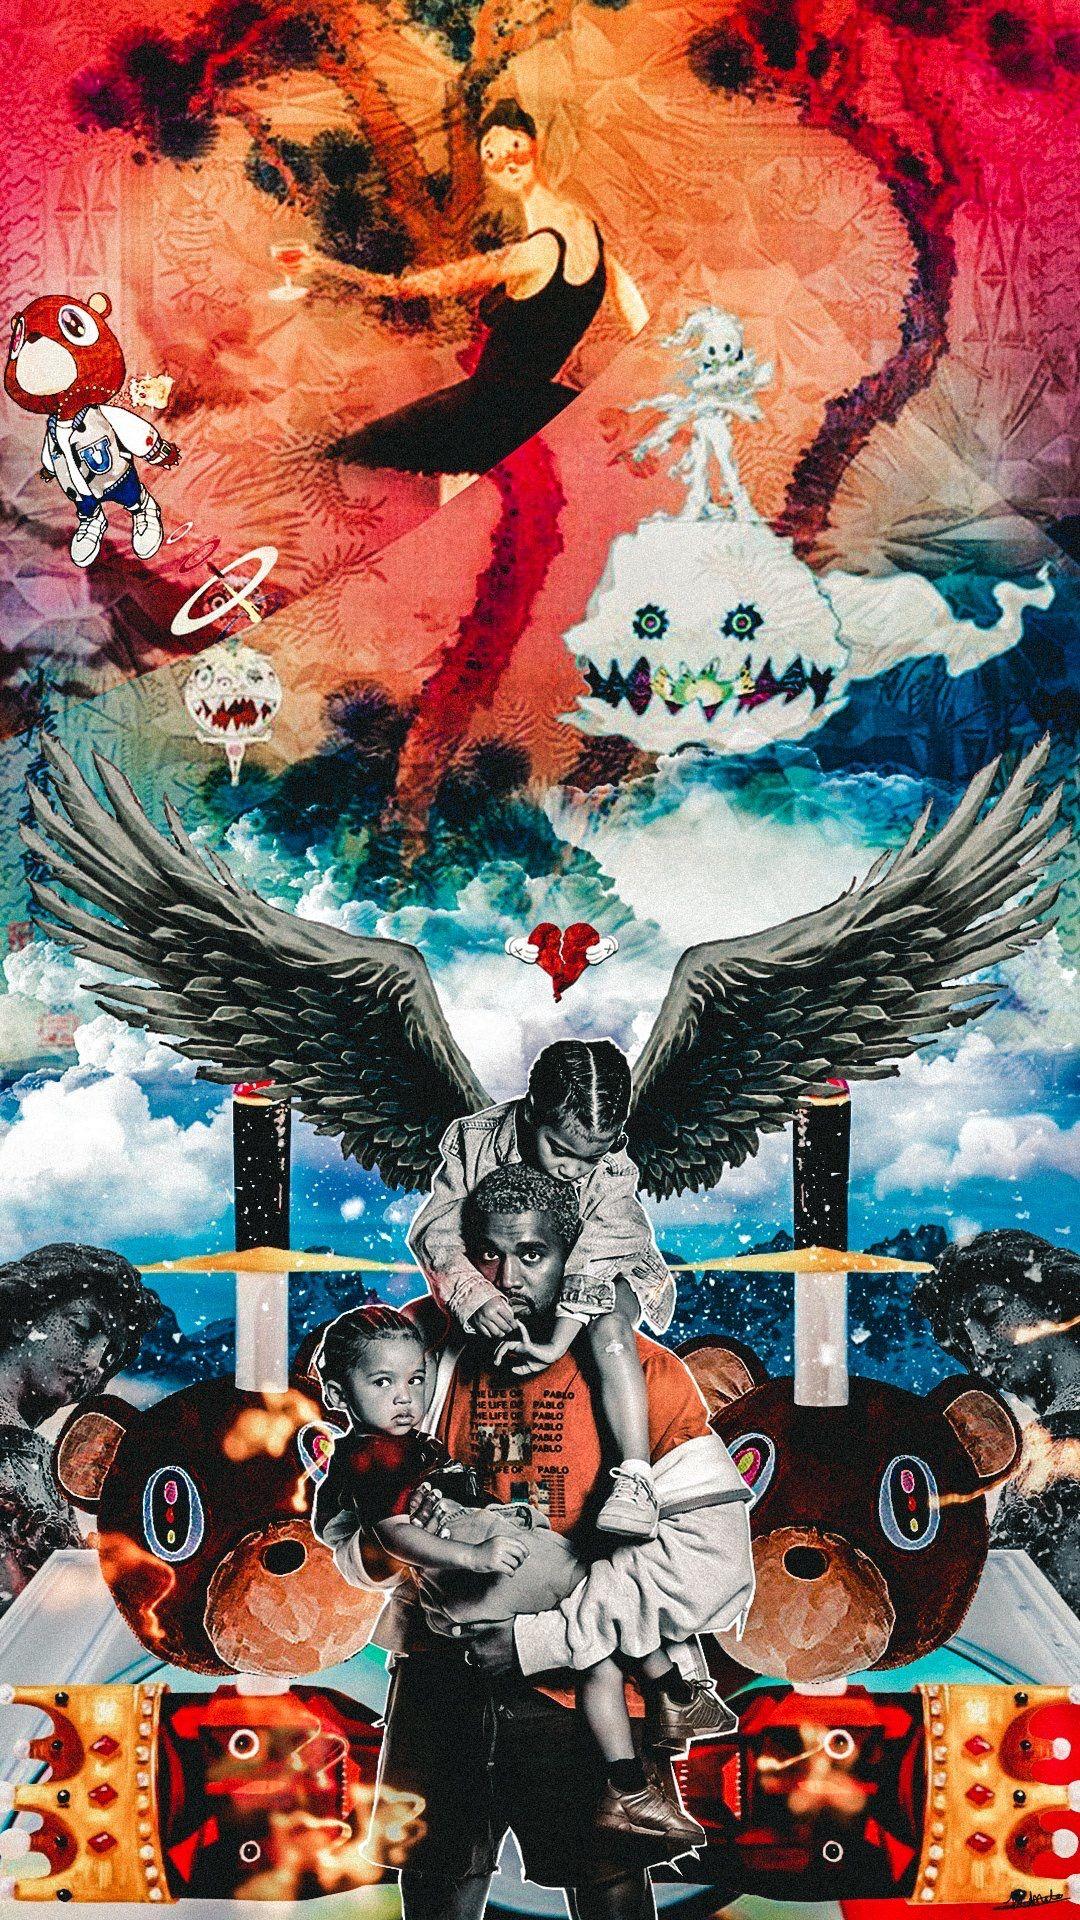 C O L L A G E image by Meg Quinn Yeezus wallpaper, Kanye